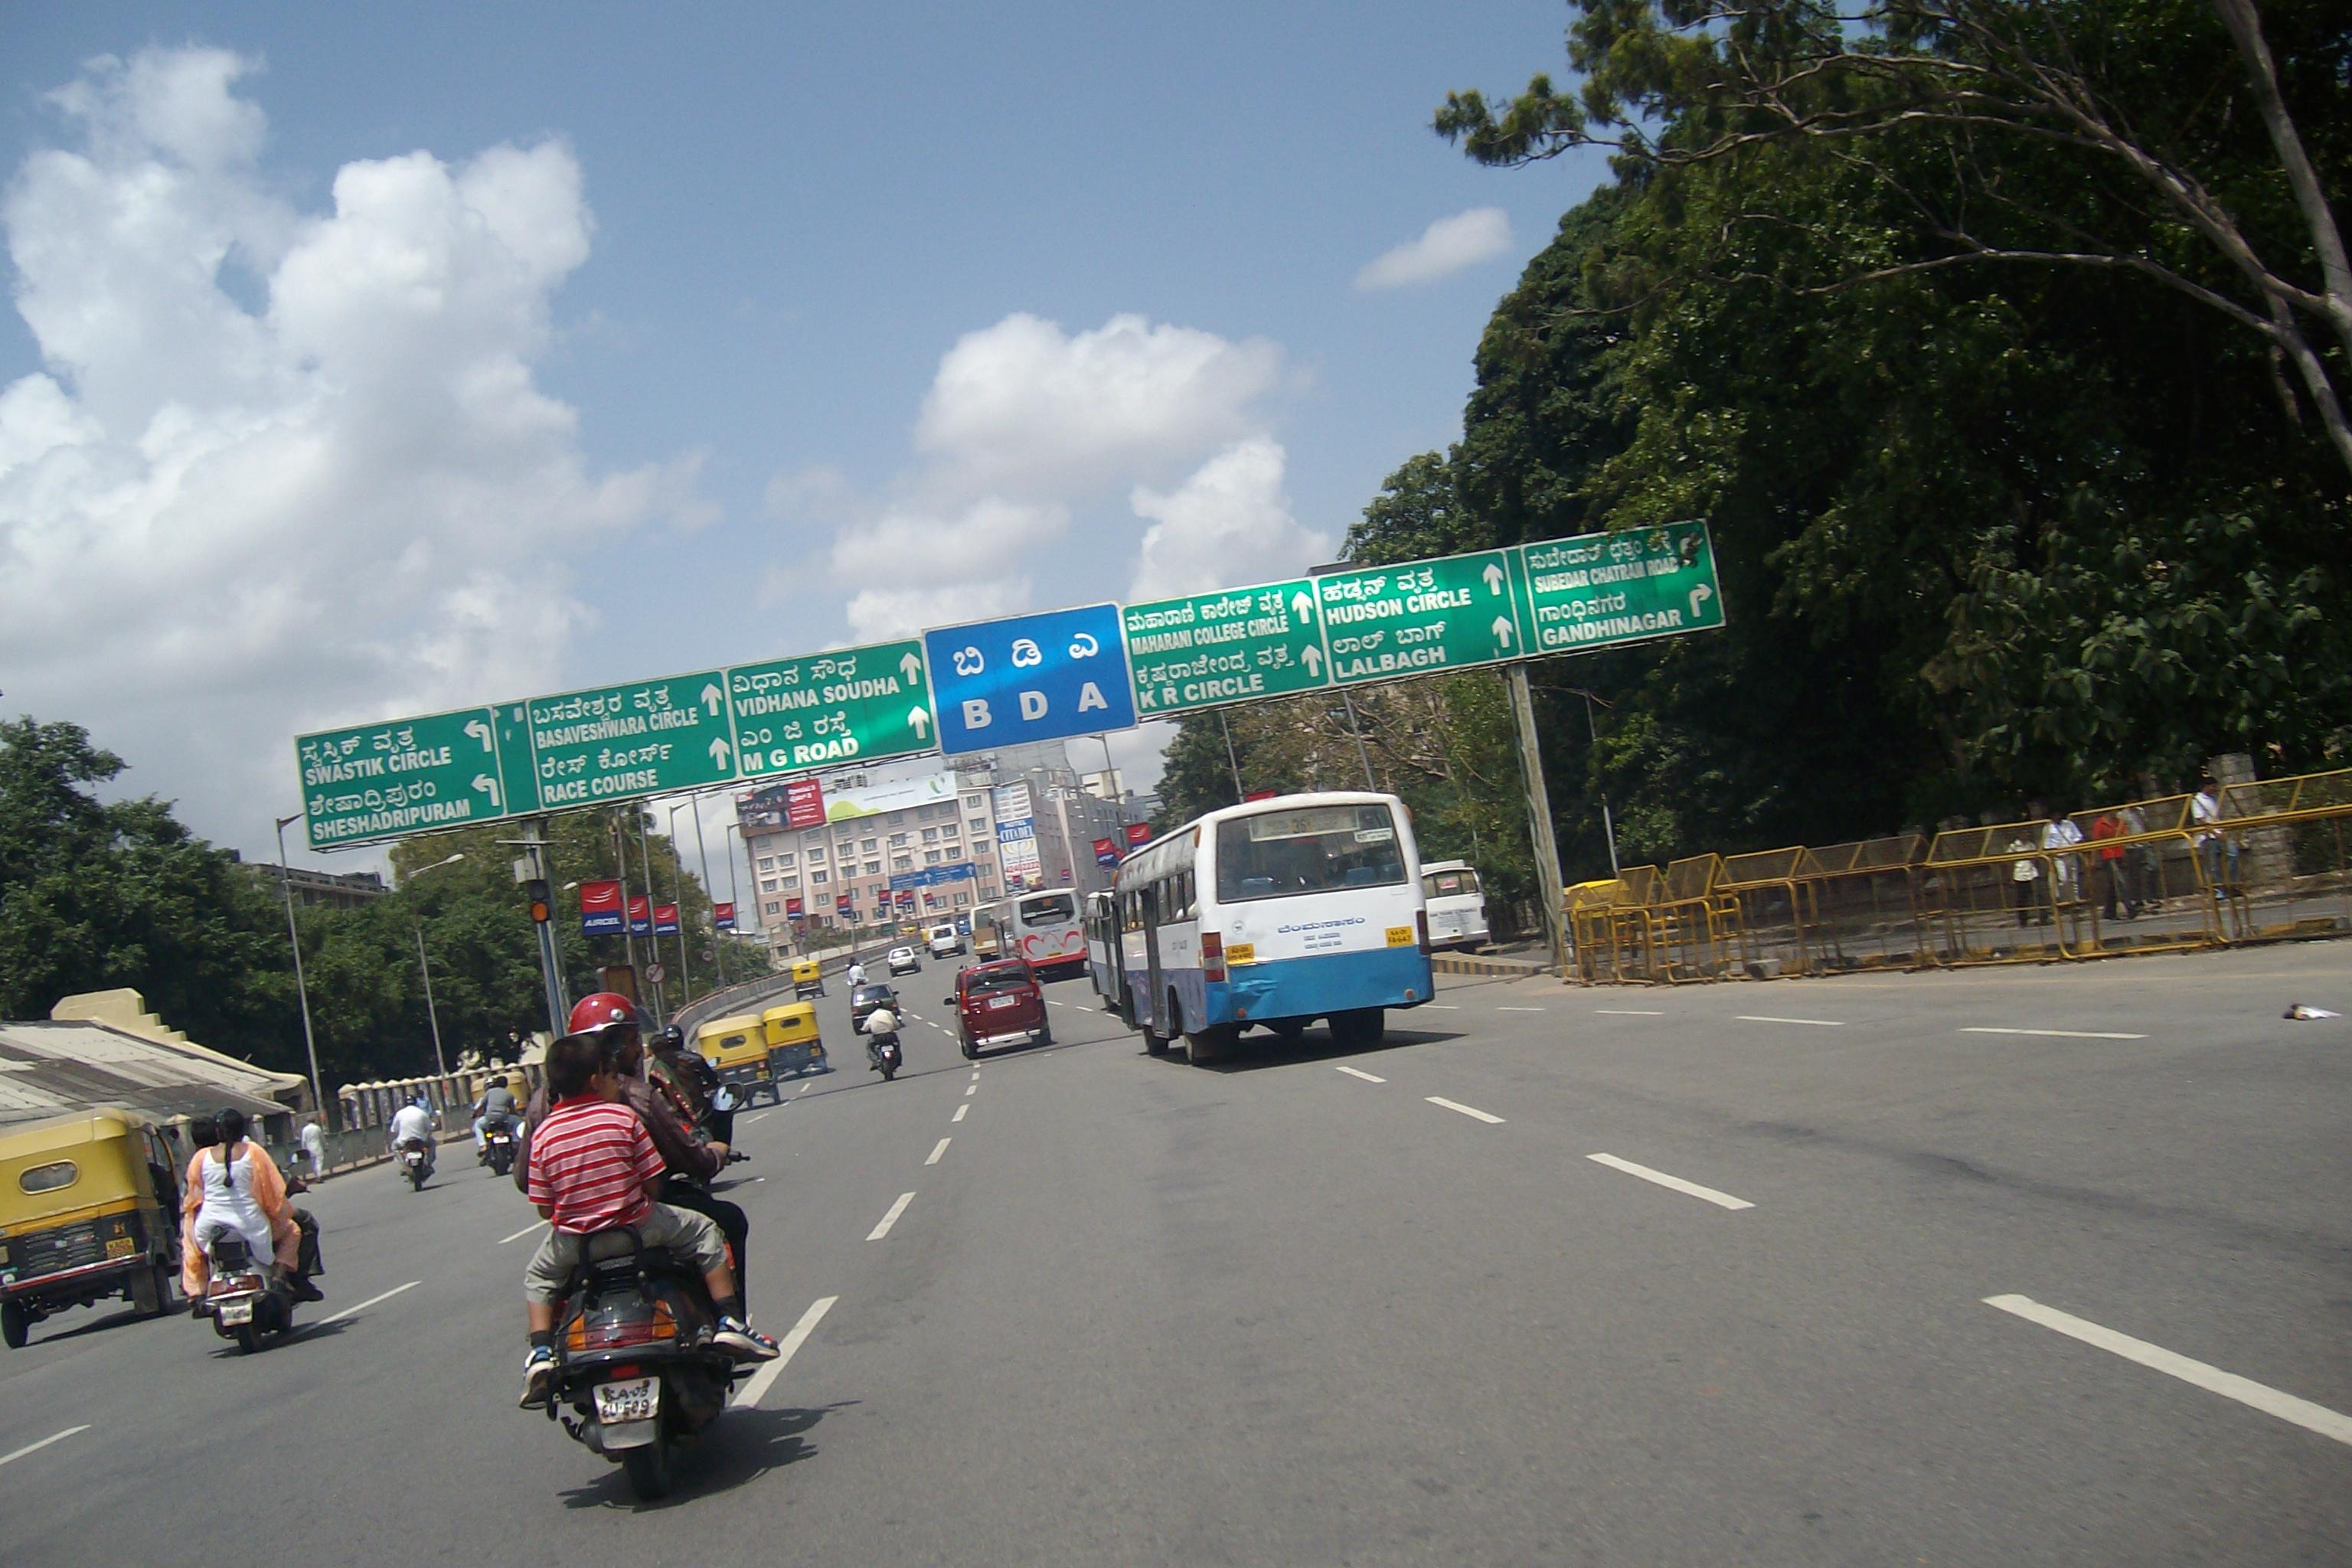 anand rao circle bangalore map File Anandrao Circle Fly Over Bengaluru Panoramio Jpg anand rao circle bangalore map